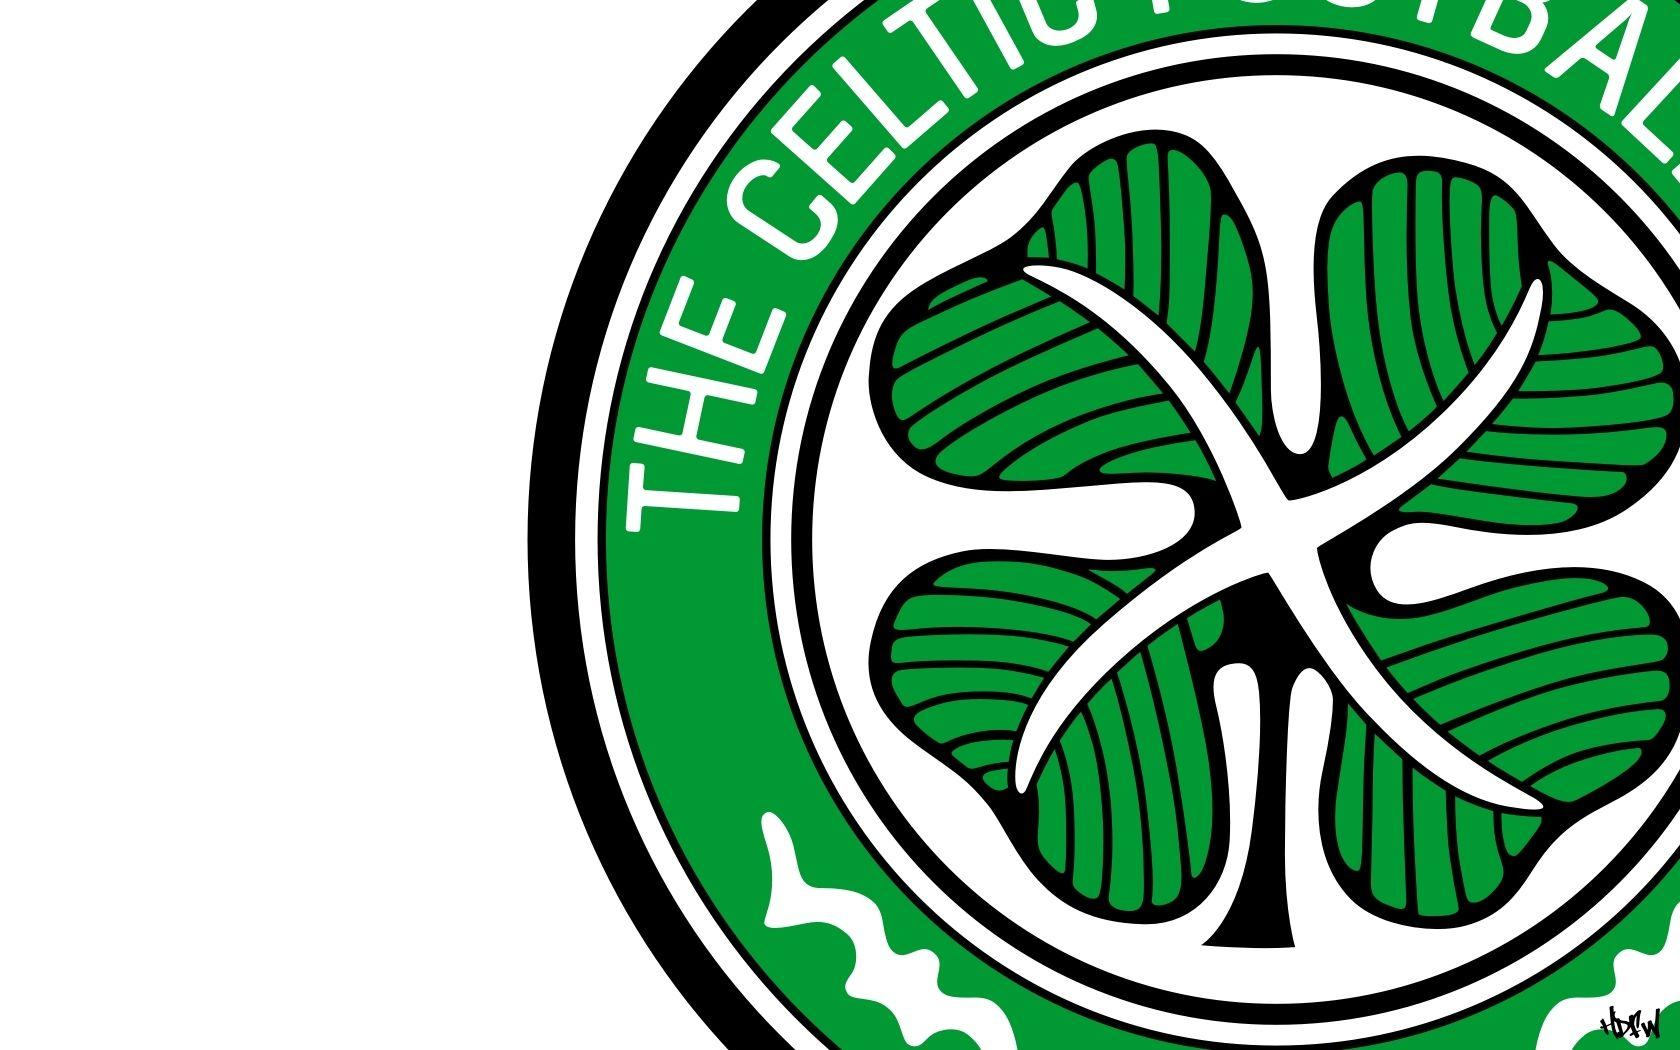 Glasgow celtic fc Logos